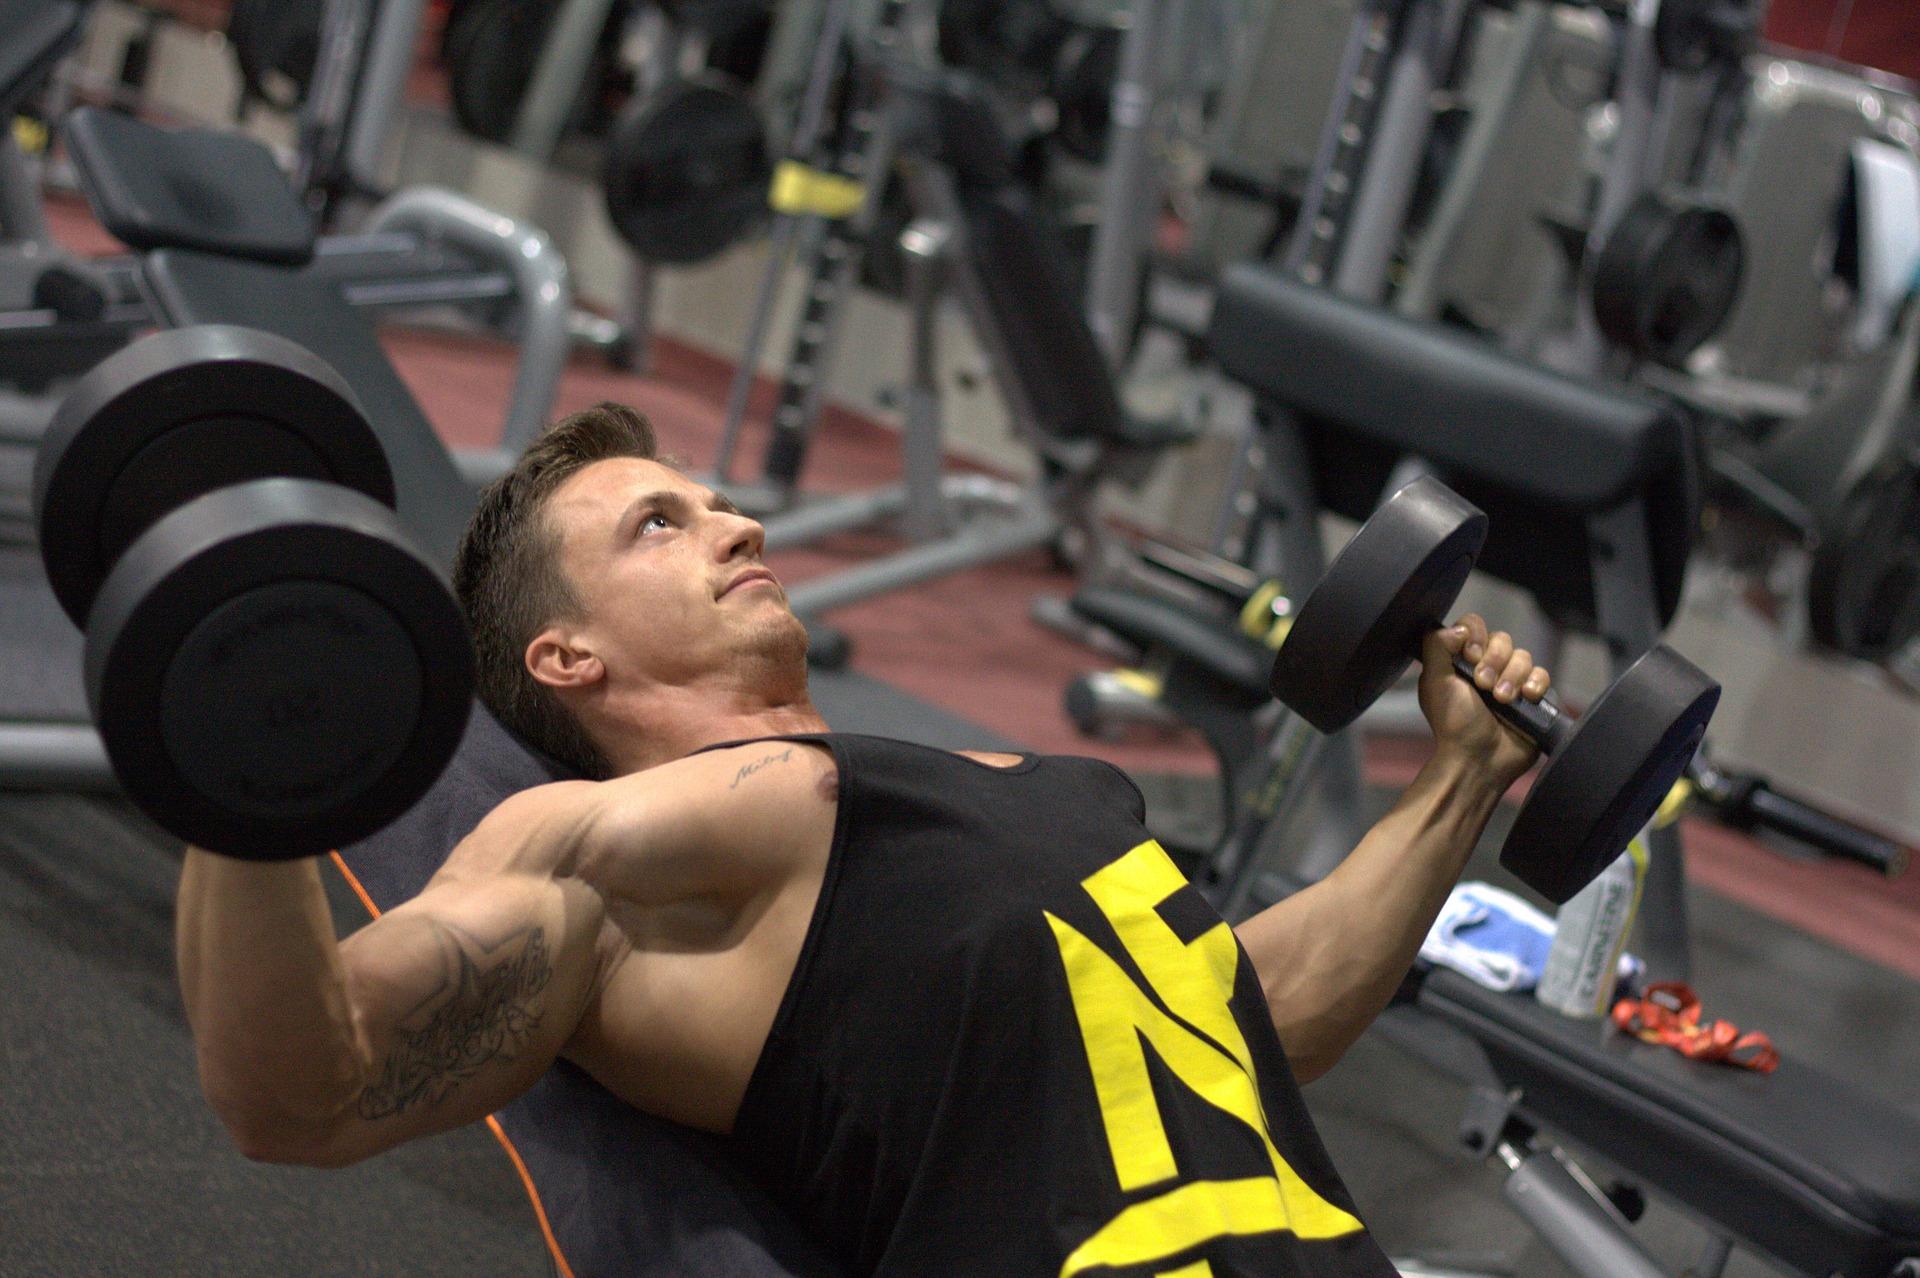 Allee edzőterem, avagy a Life1 Allee Fitness - Edzoterem.info